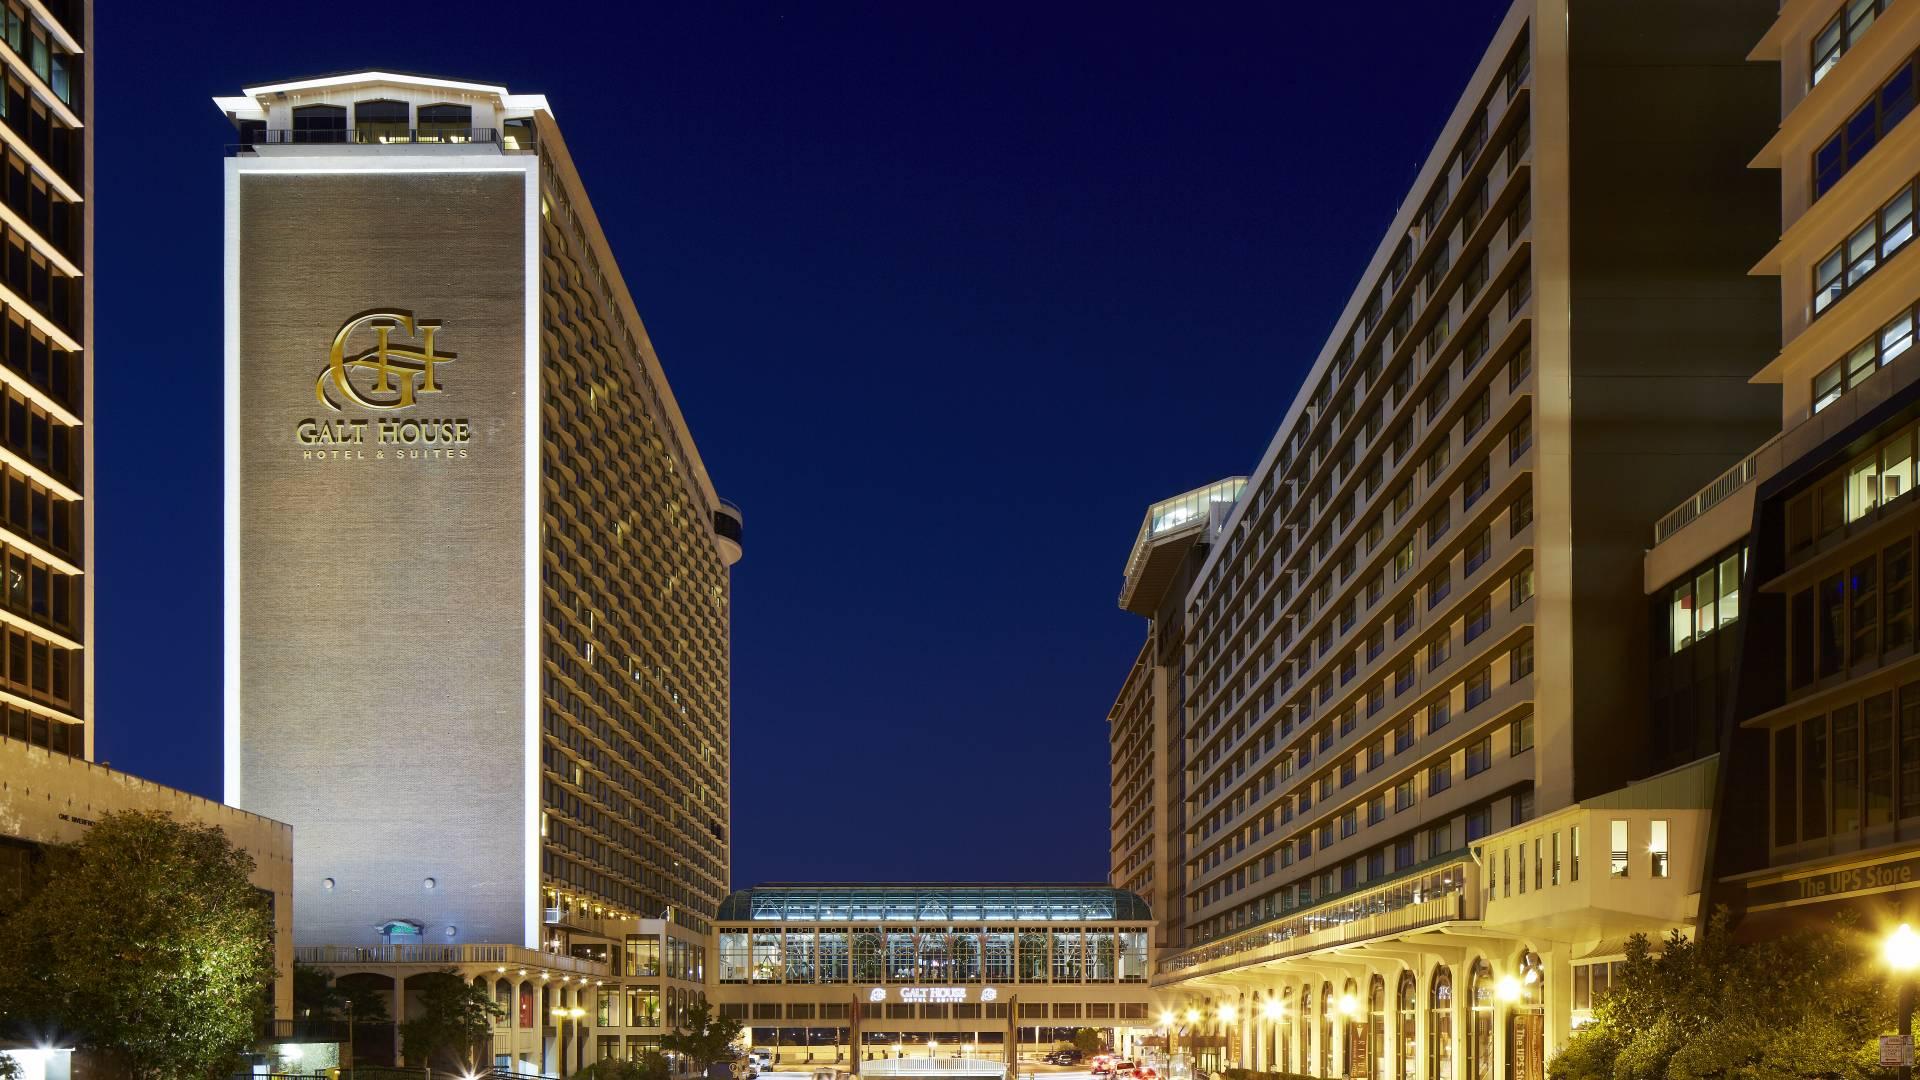 Galt House Hotel & Suites